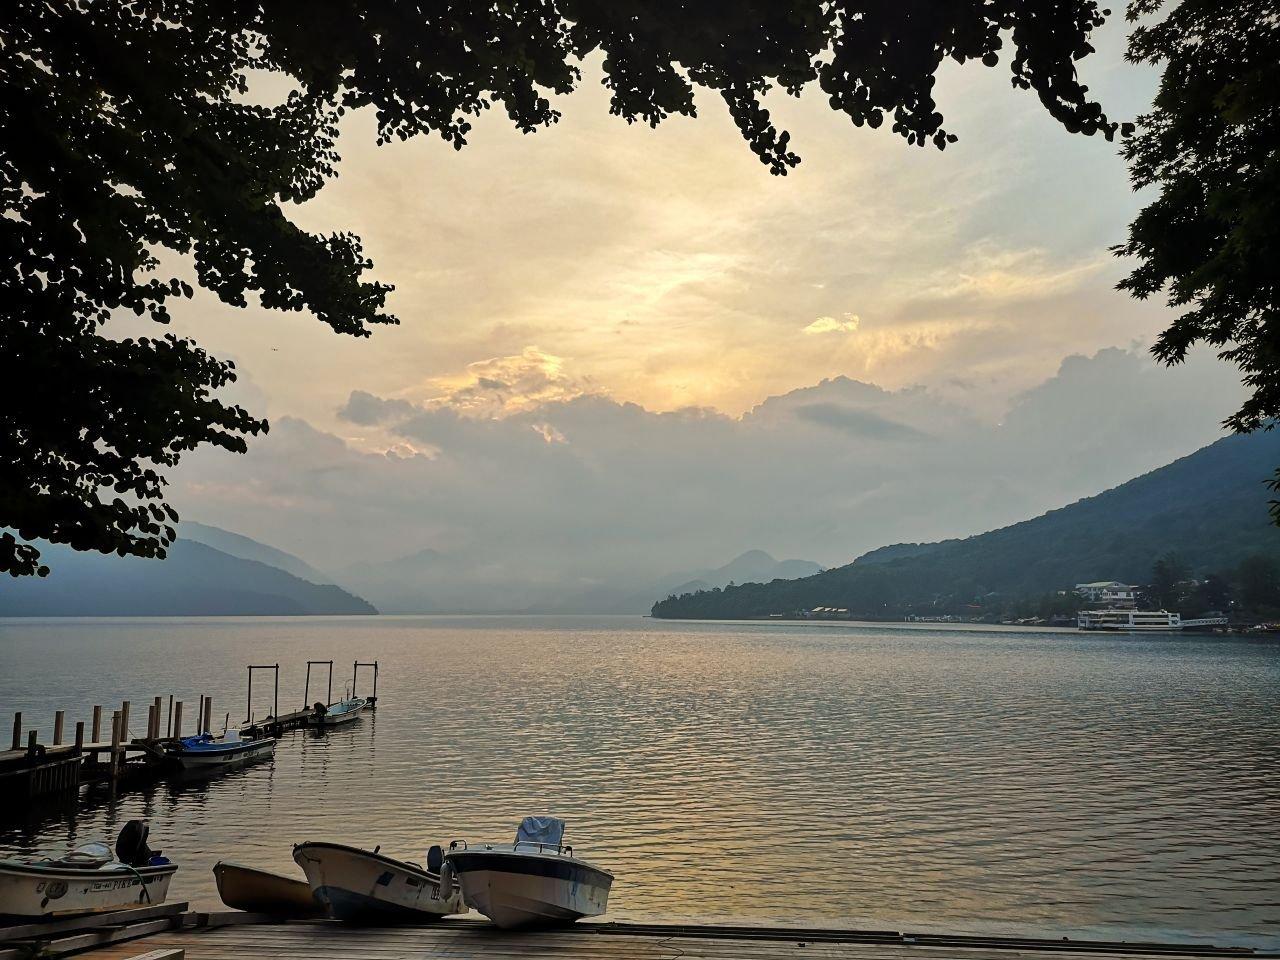 Trip: Nikko and Chuzenji lake